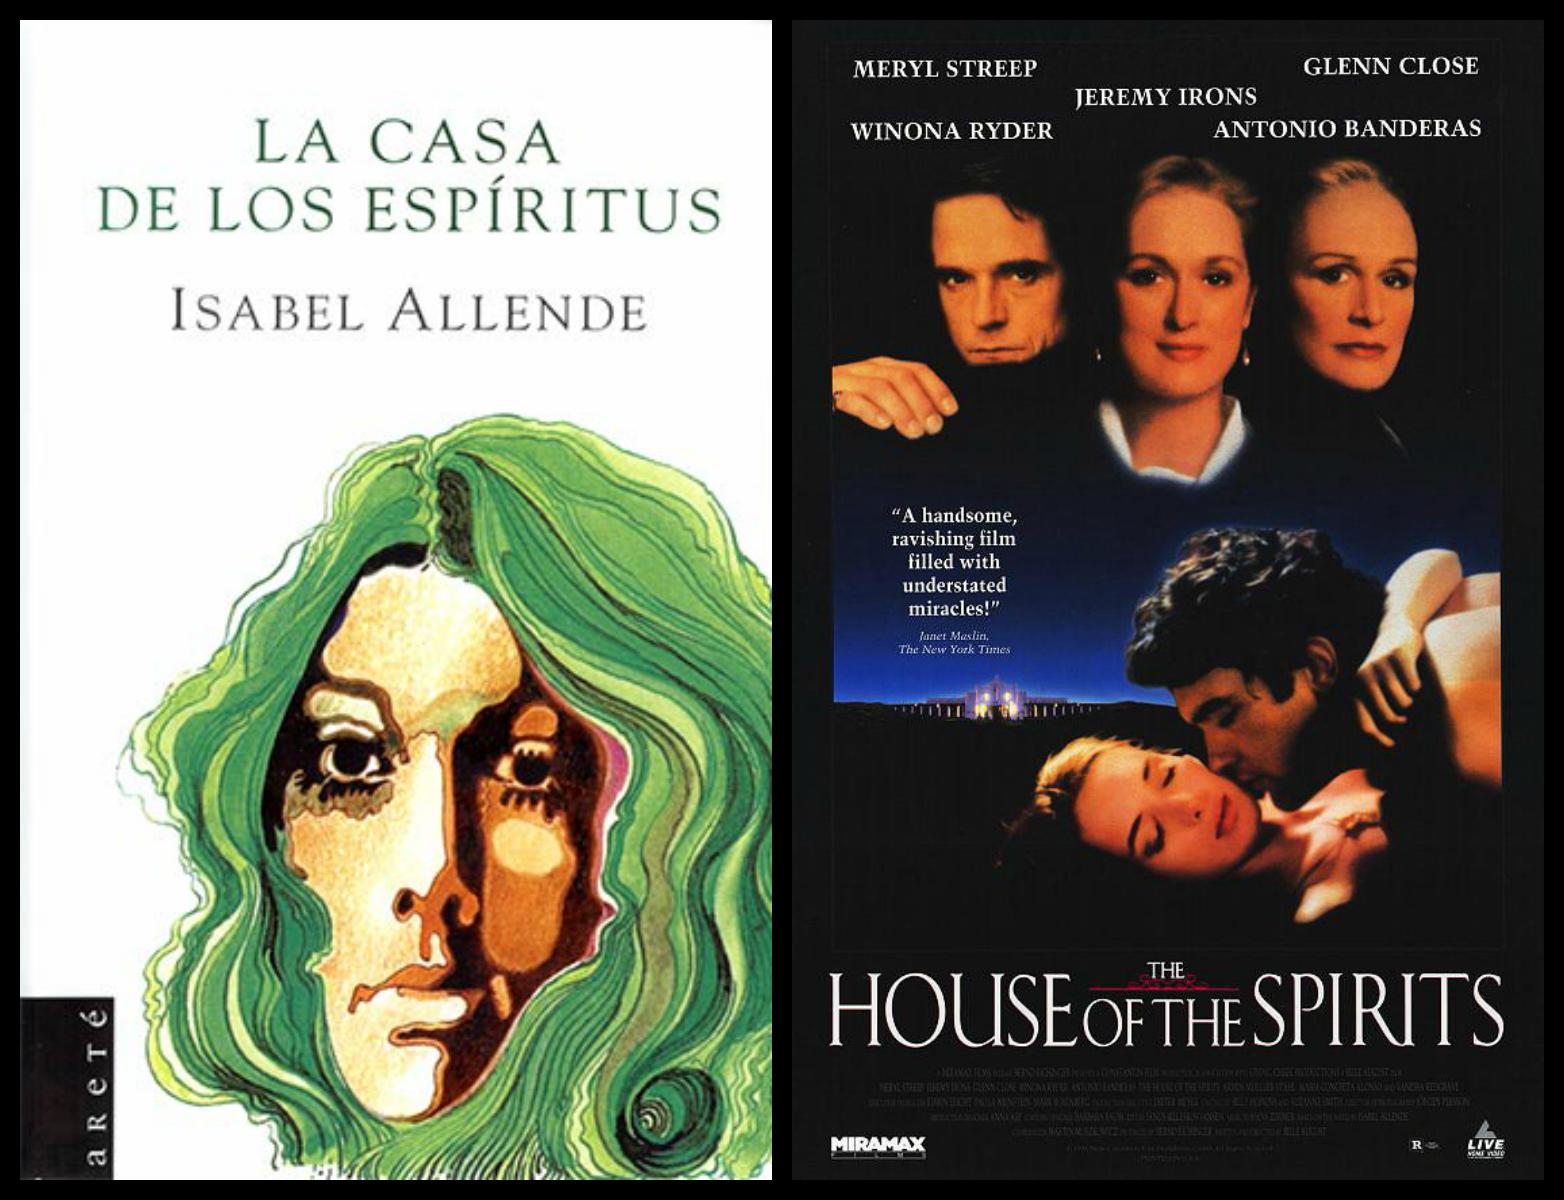 La Casa De Los Espíritus Winona Ryder Meryl Streep Glenn Close